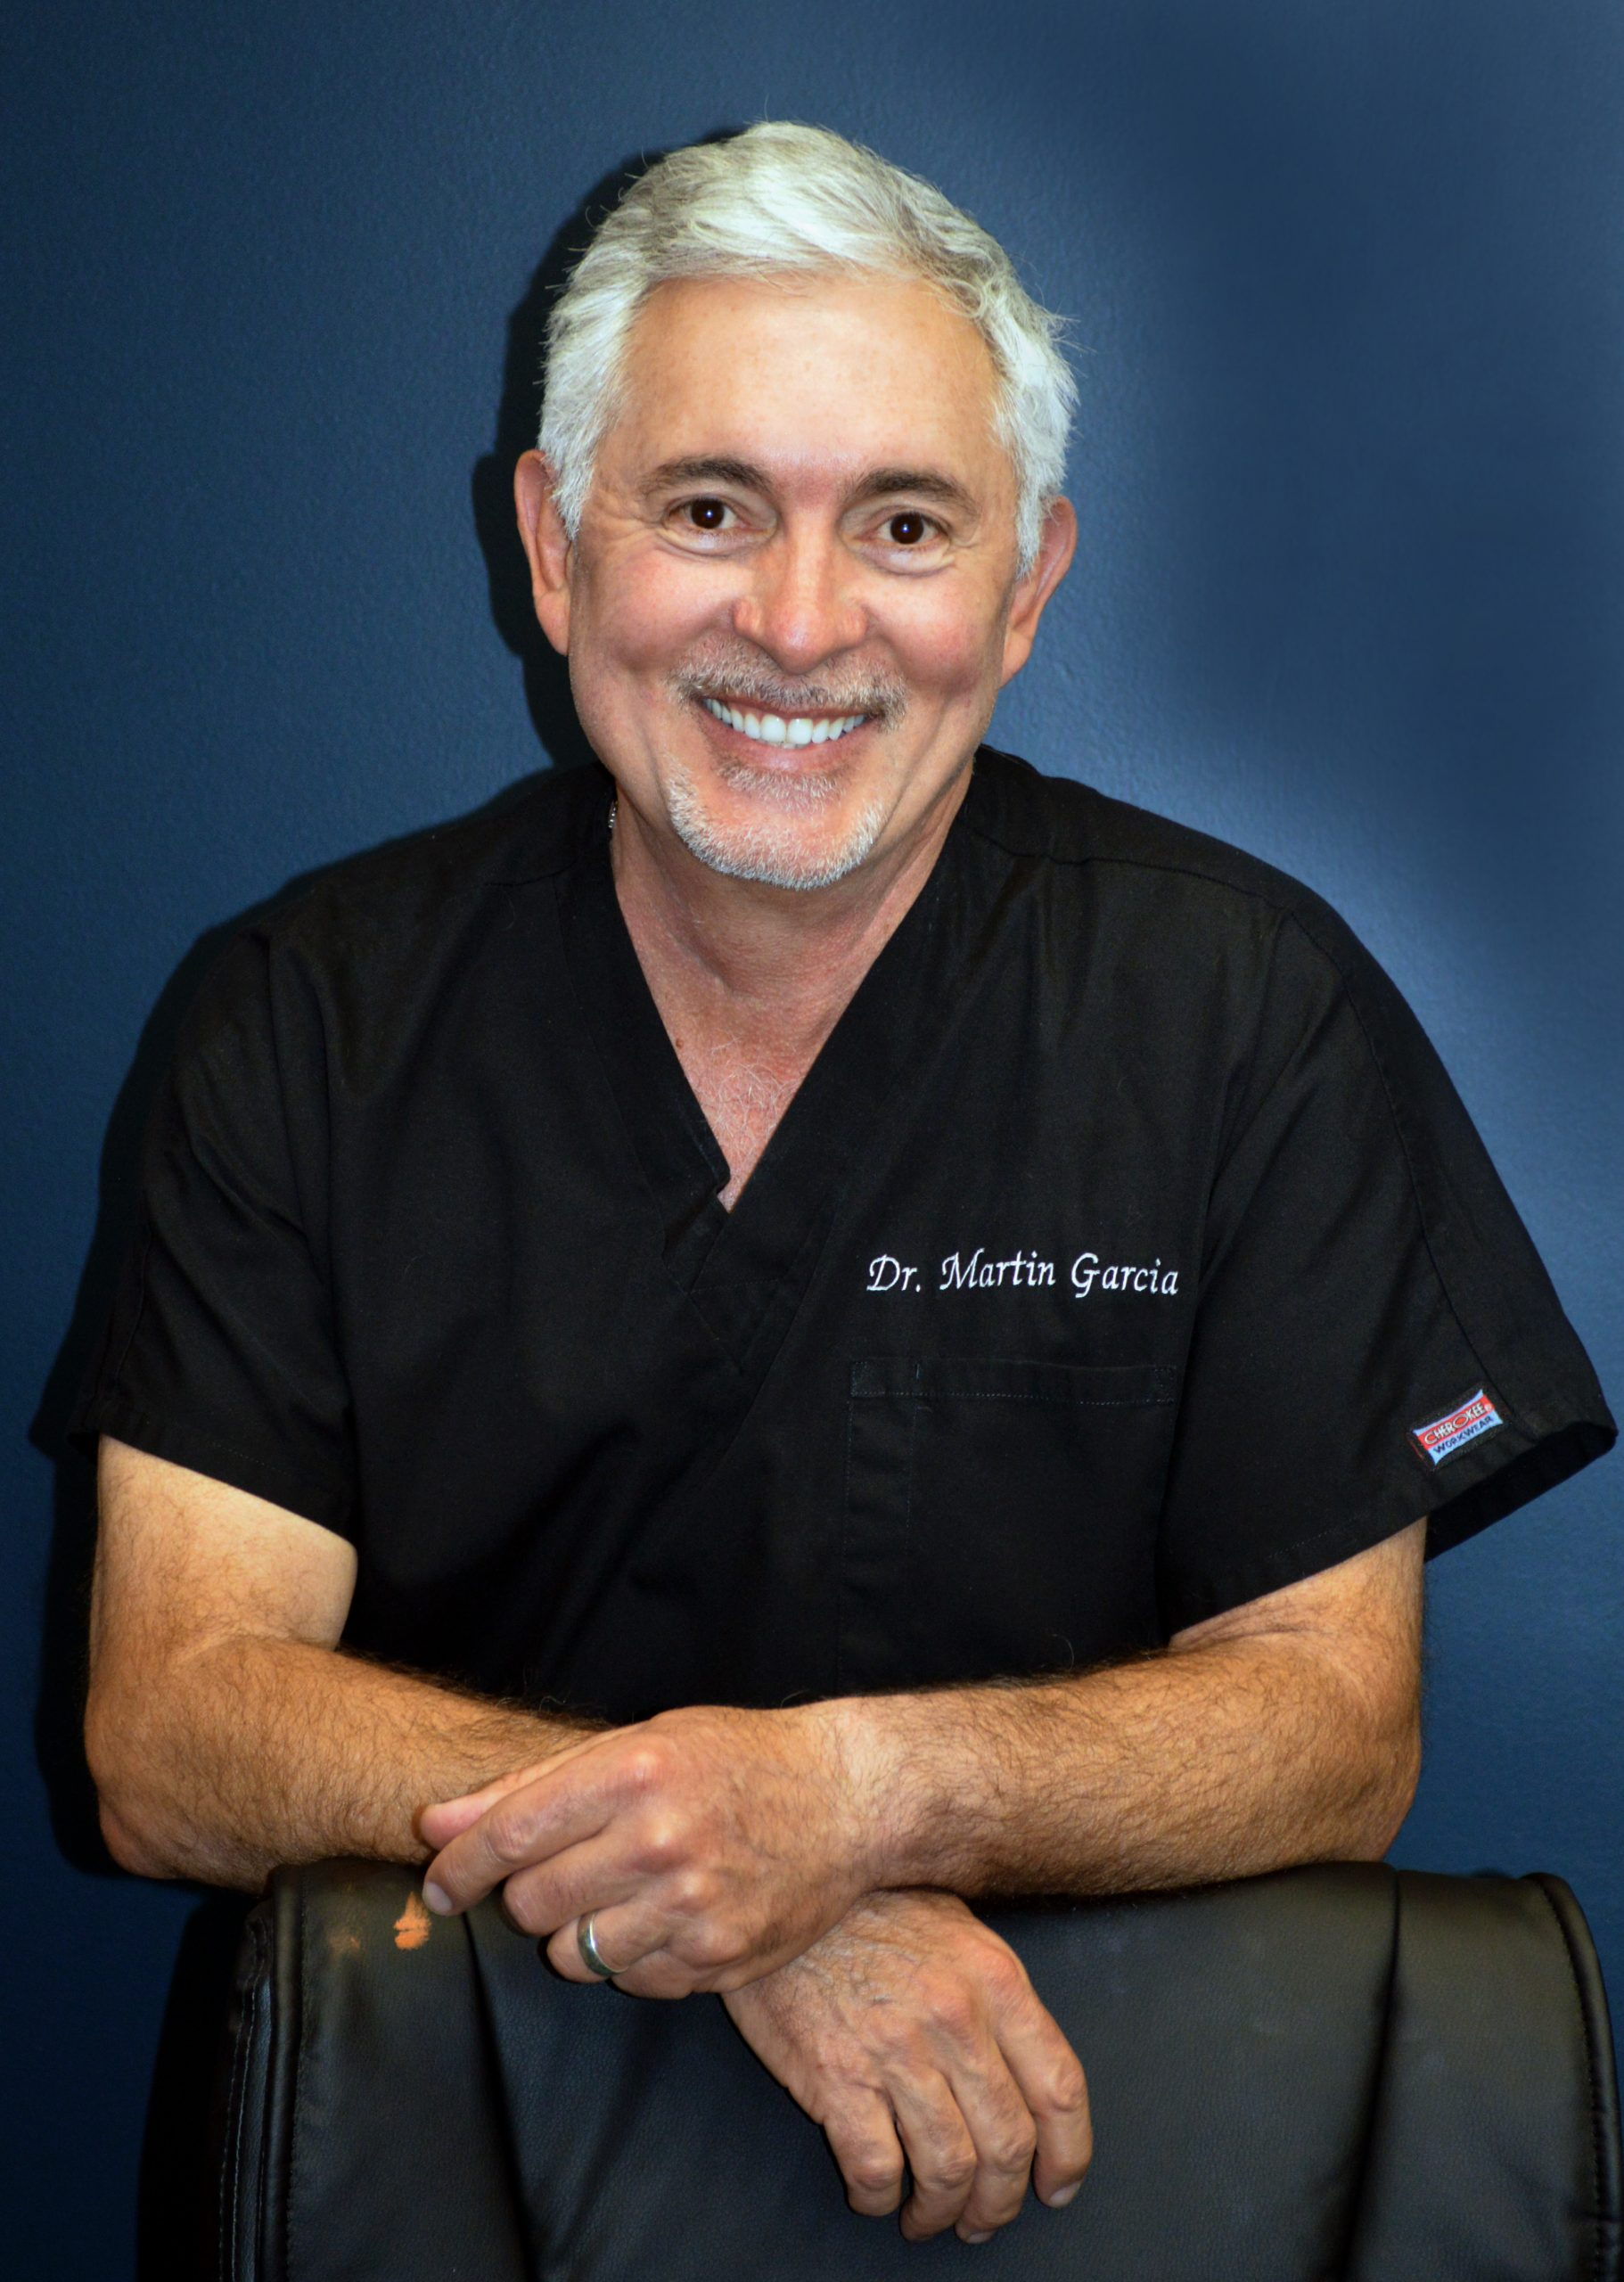 Dr. Martin Garcia